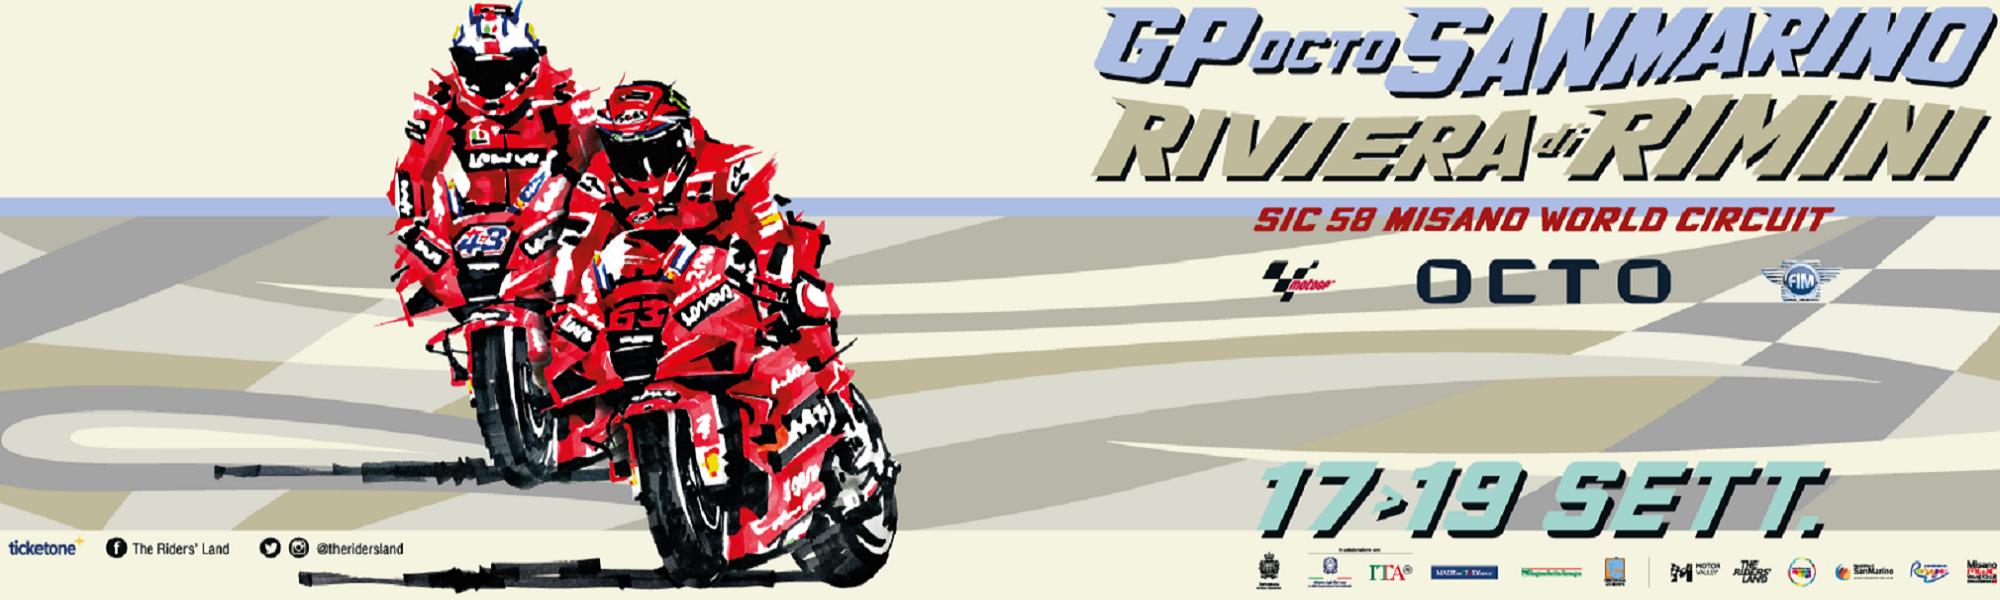 Moto GP, motomondiale, Misano World Circuit